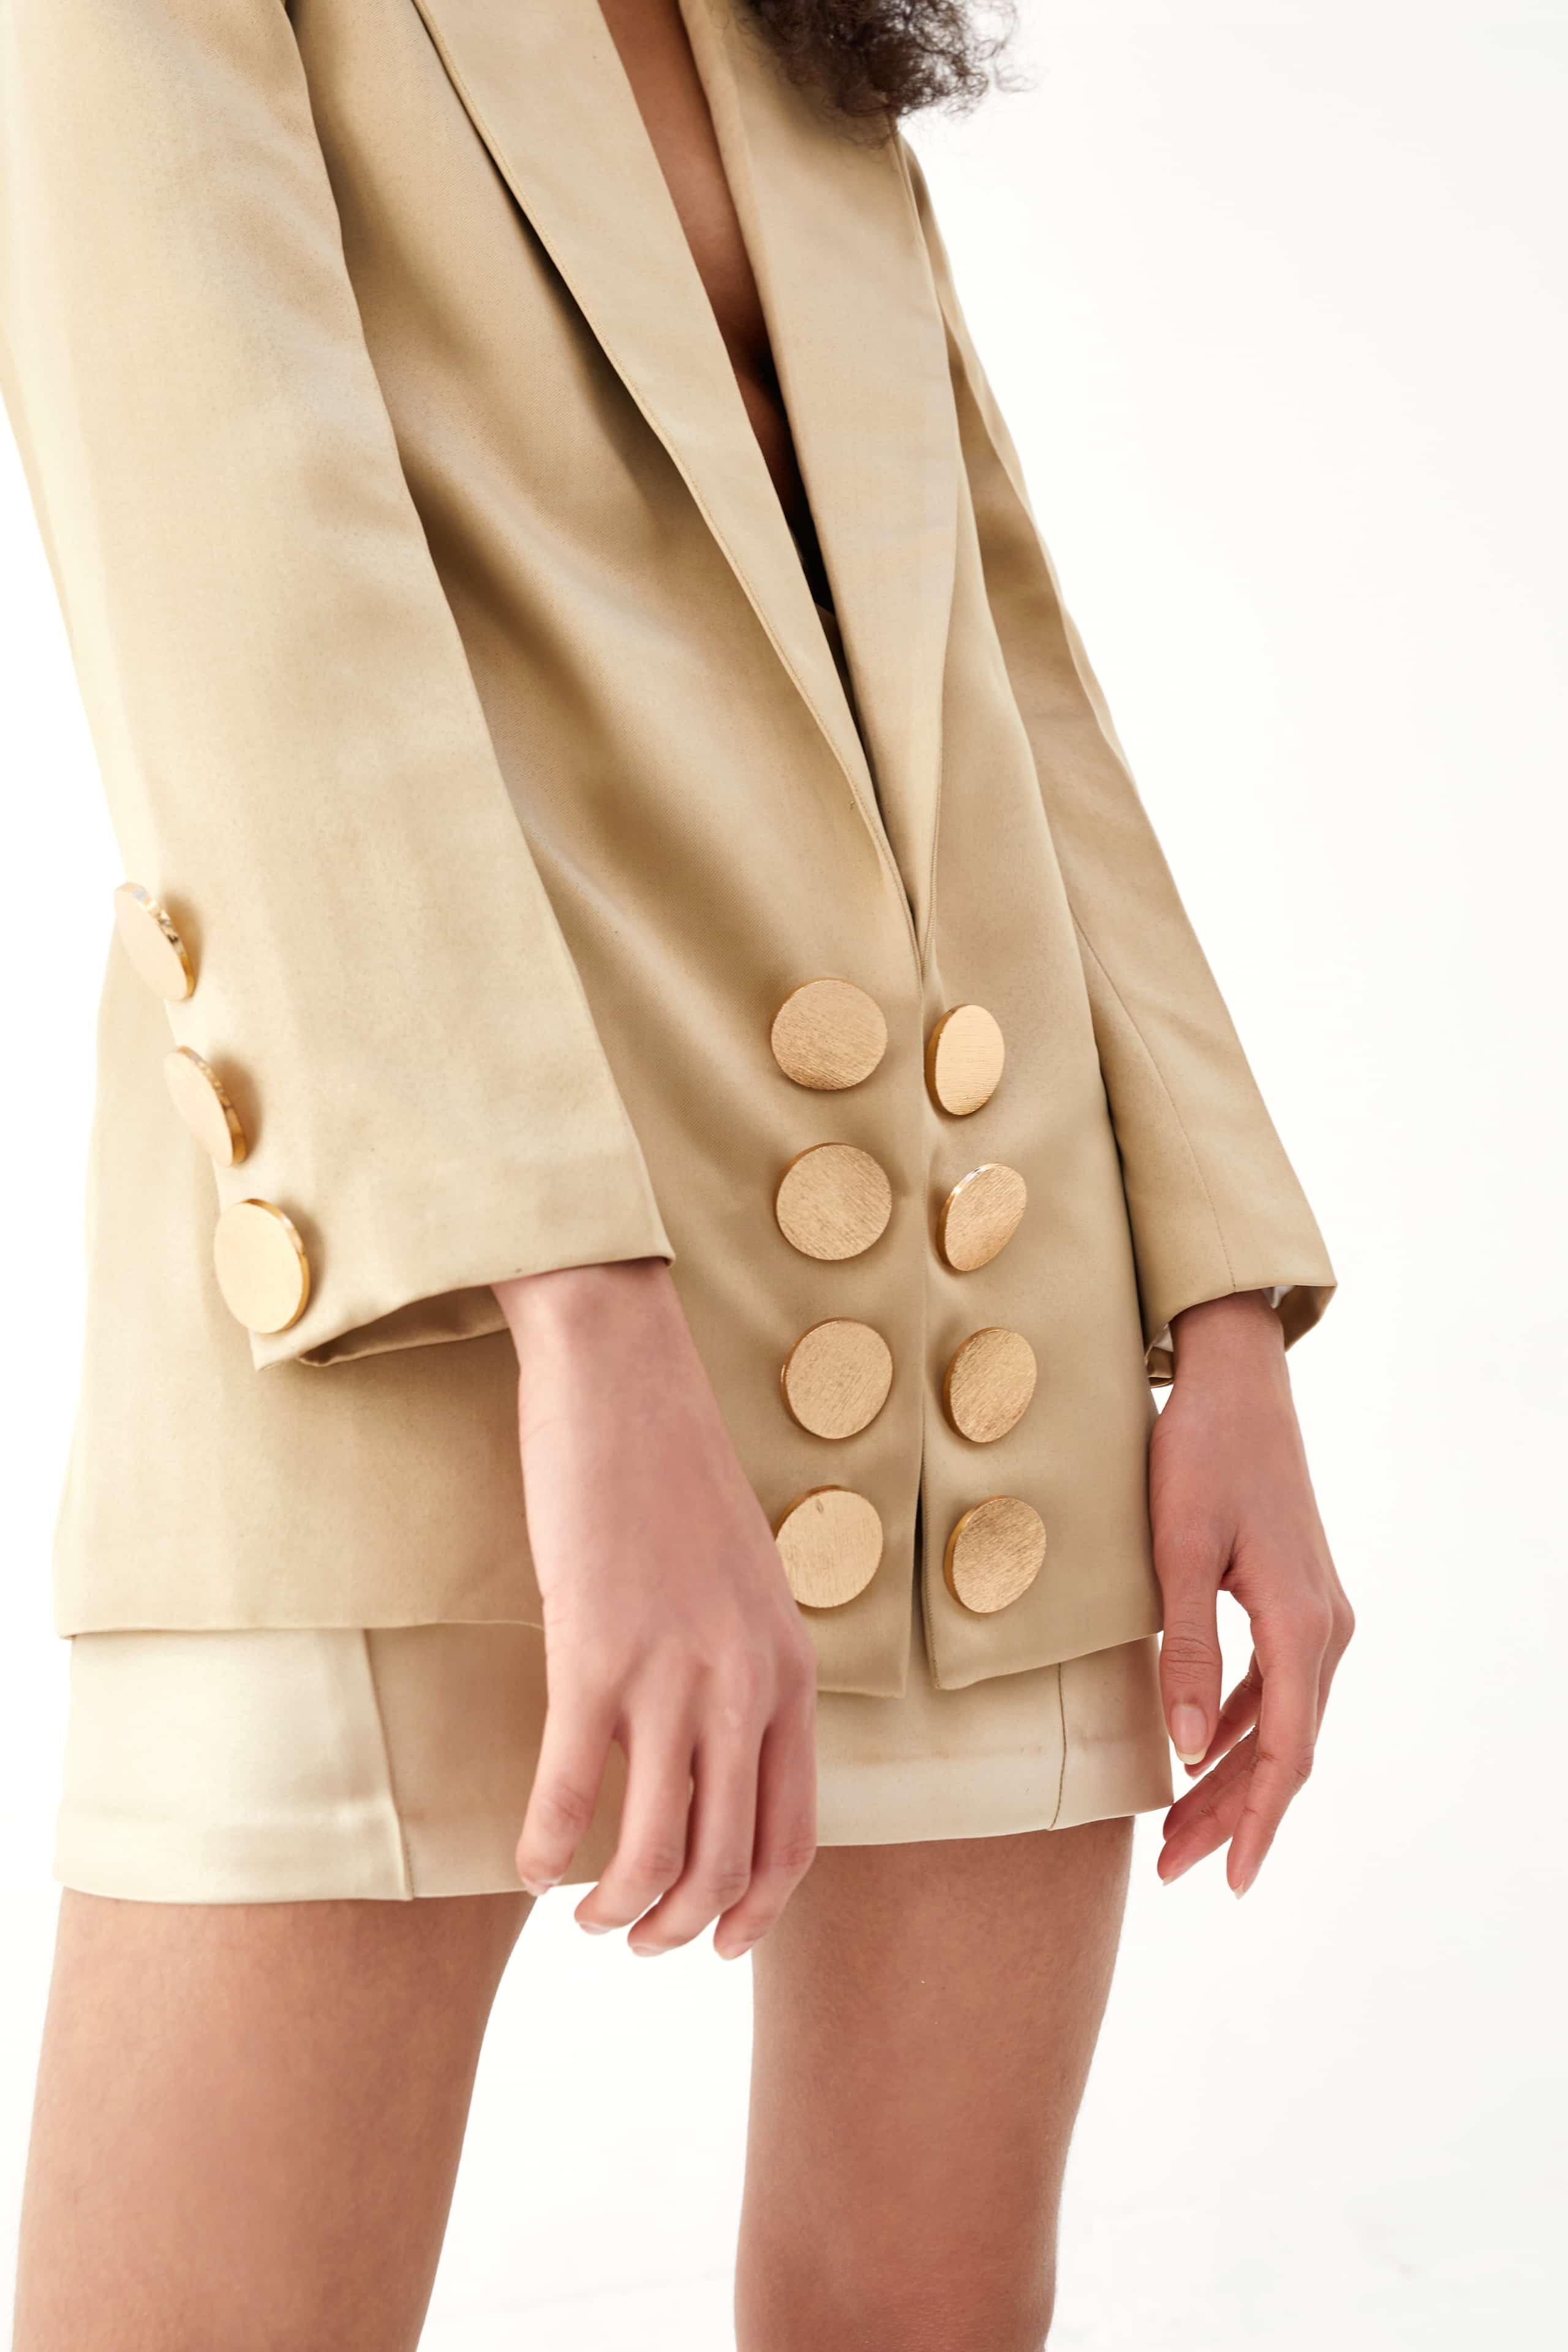 View 2 of model wearing Kalisa Blazer in sand gold.